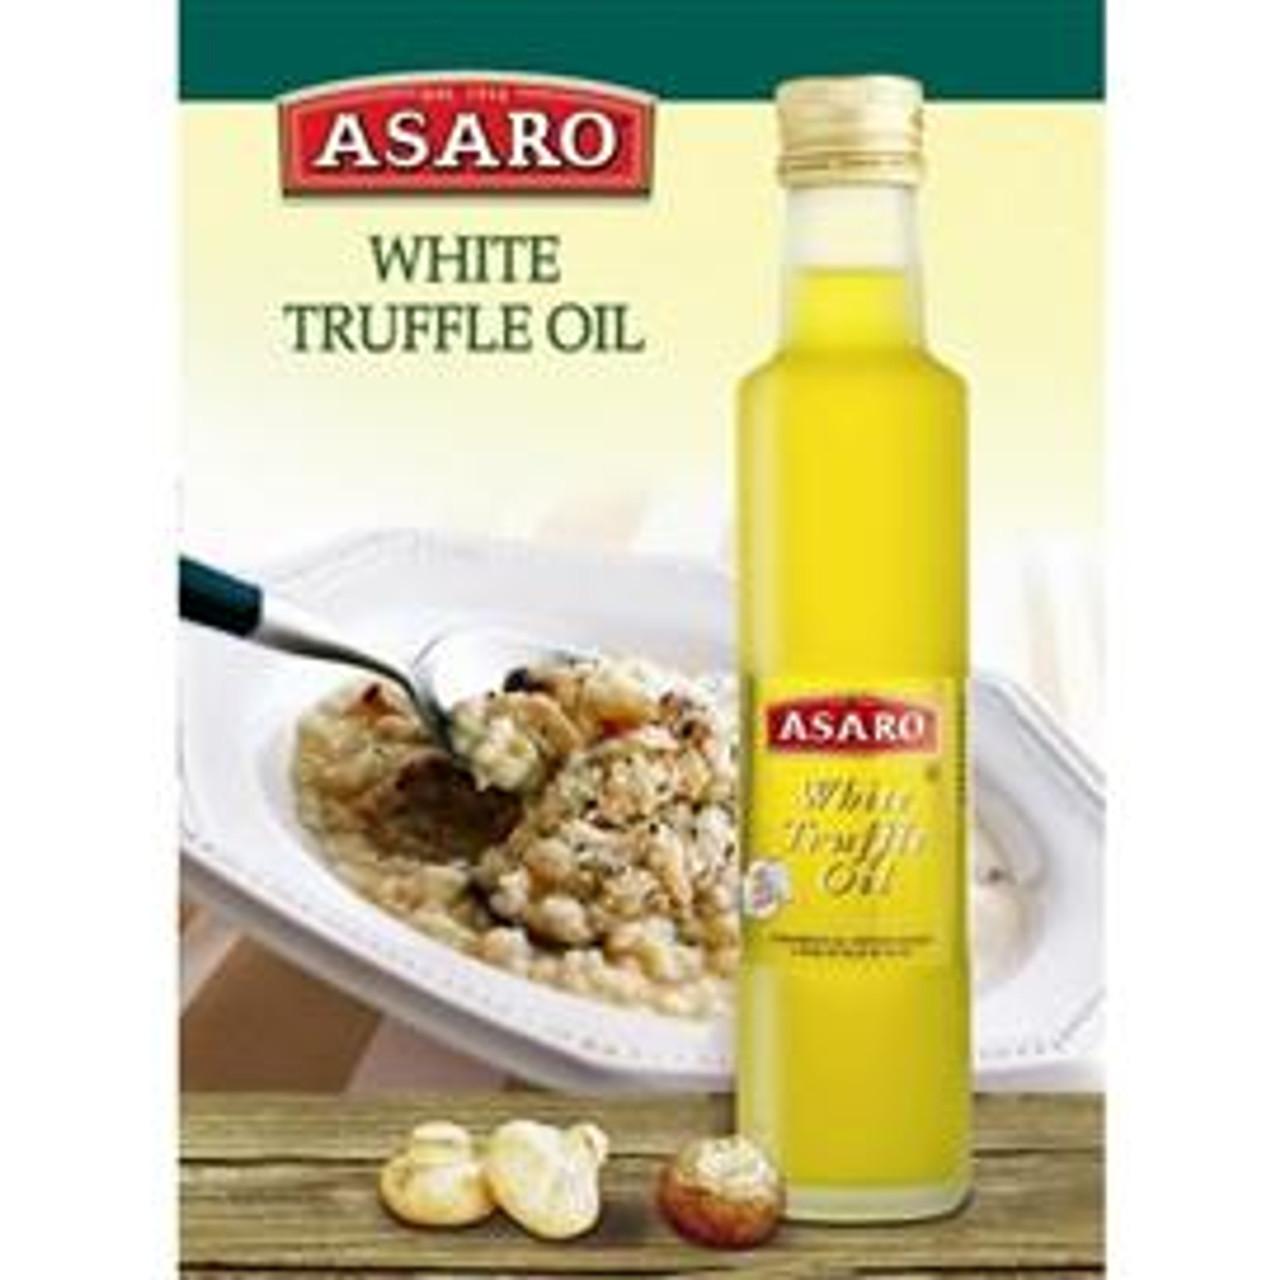 Asaro White Truffle Olive Oil